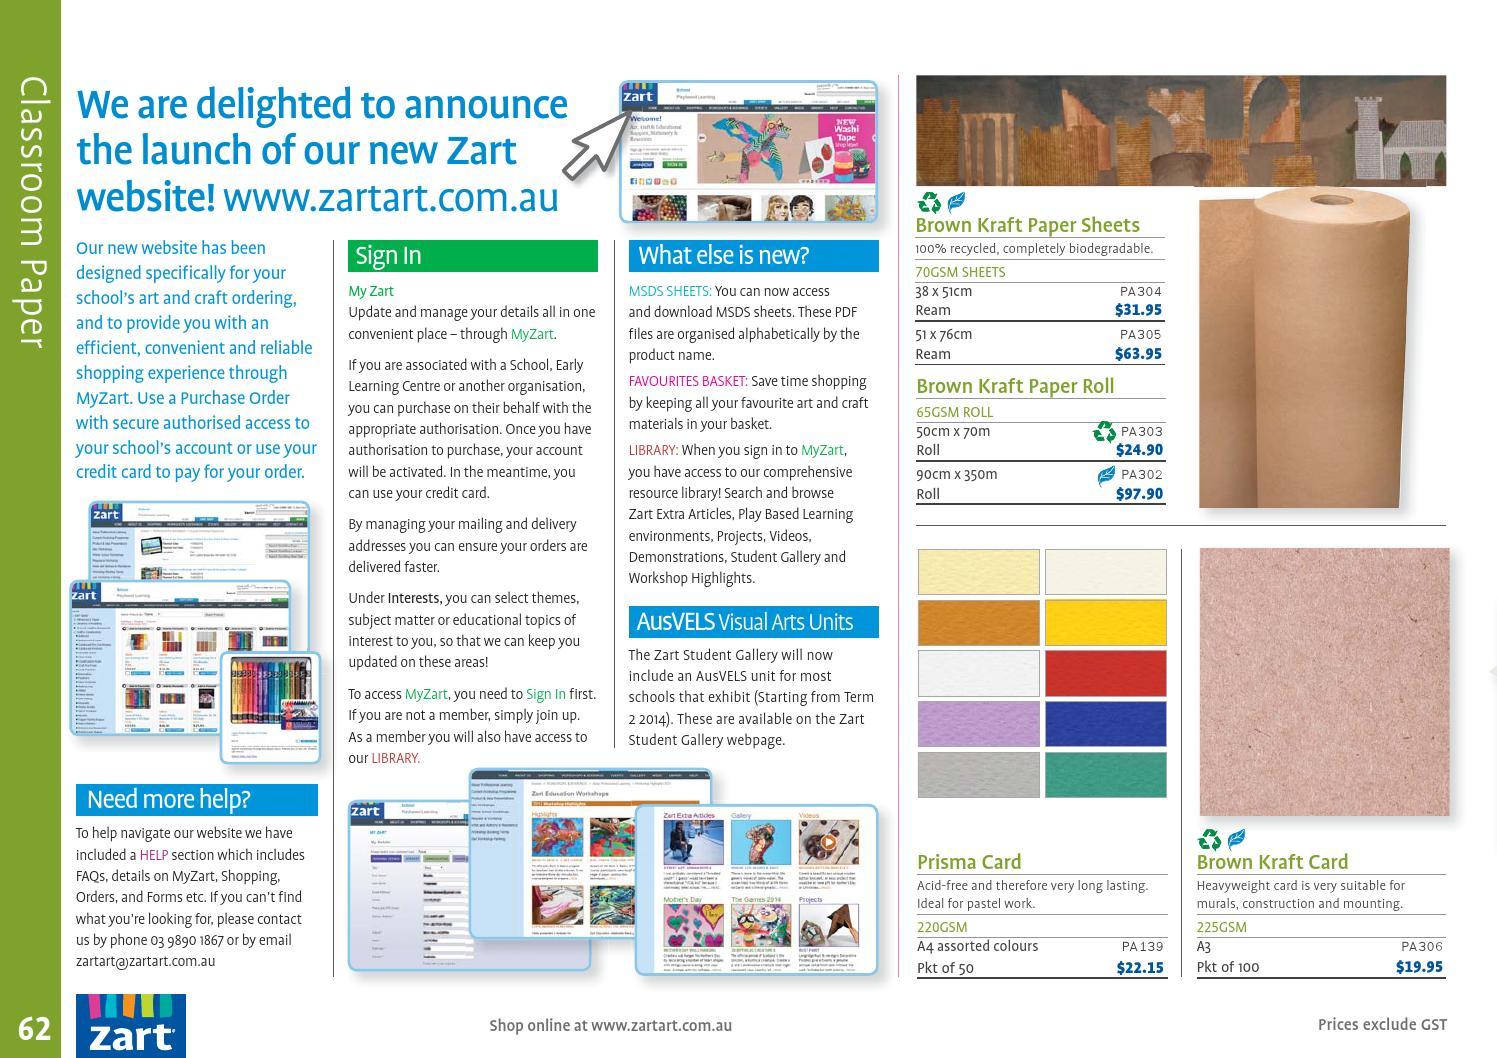 Zart Christmas Catalogue 2014 By Zart Art Craft And Education